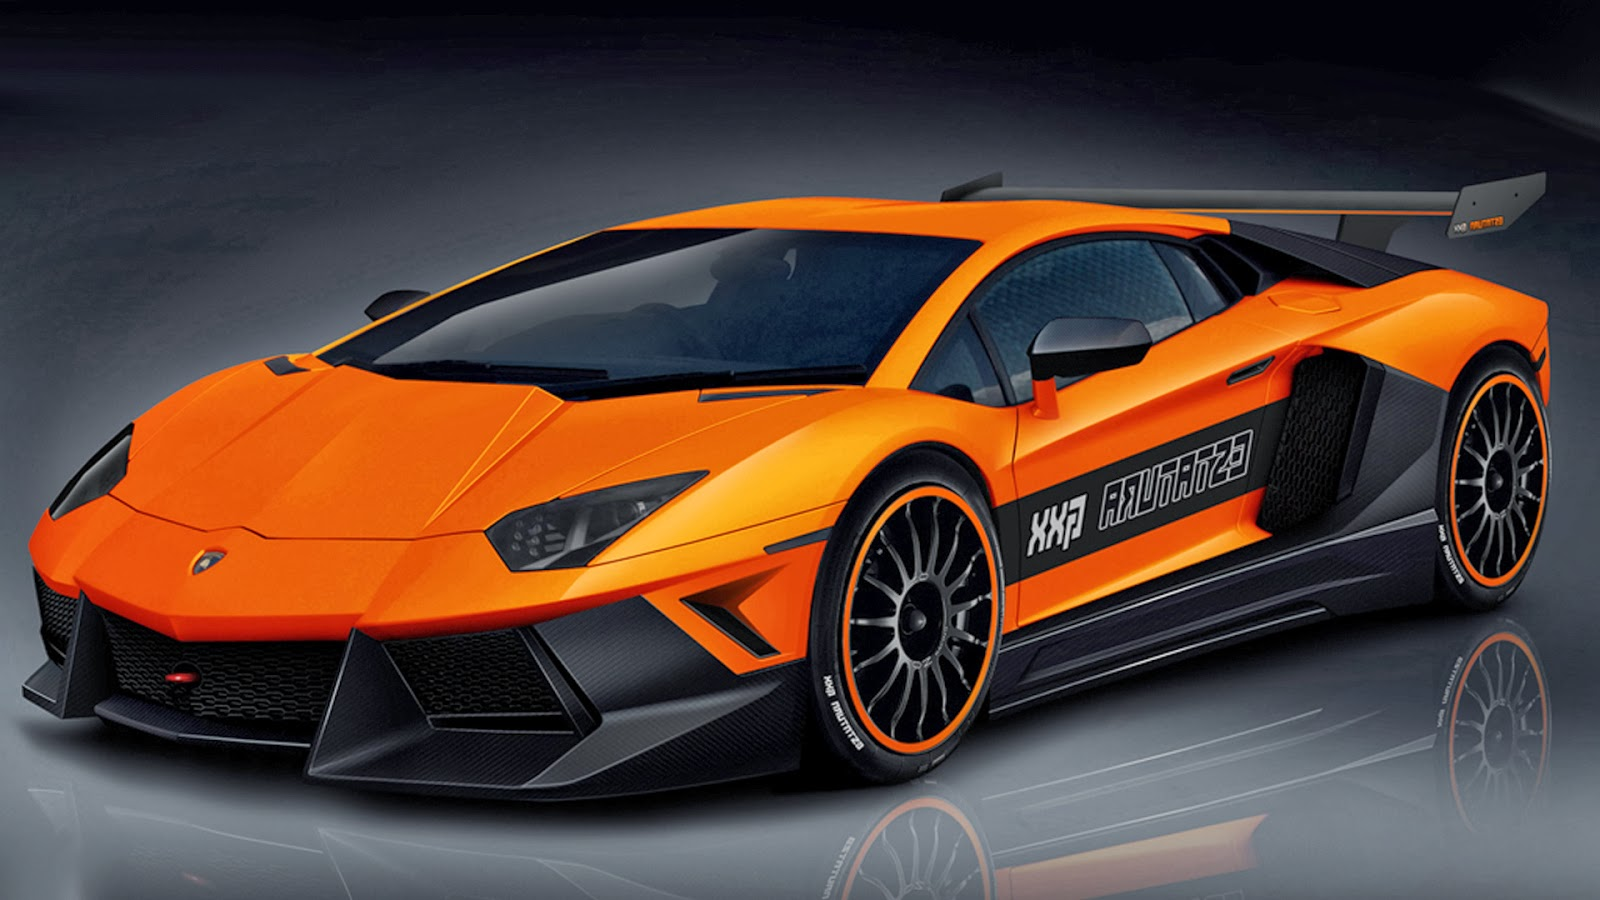 3d Wallpapers Of Cars , Lamborghini Wallpaper Hd 3d (210154